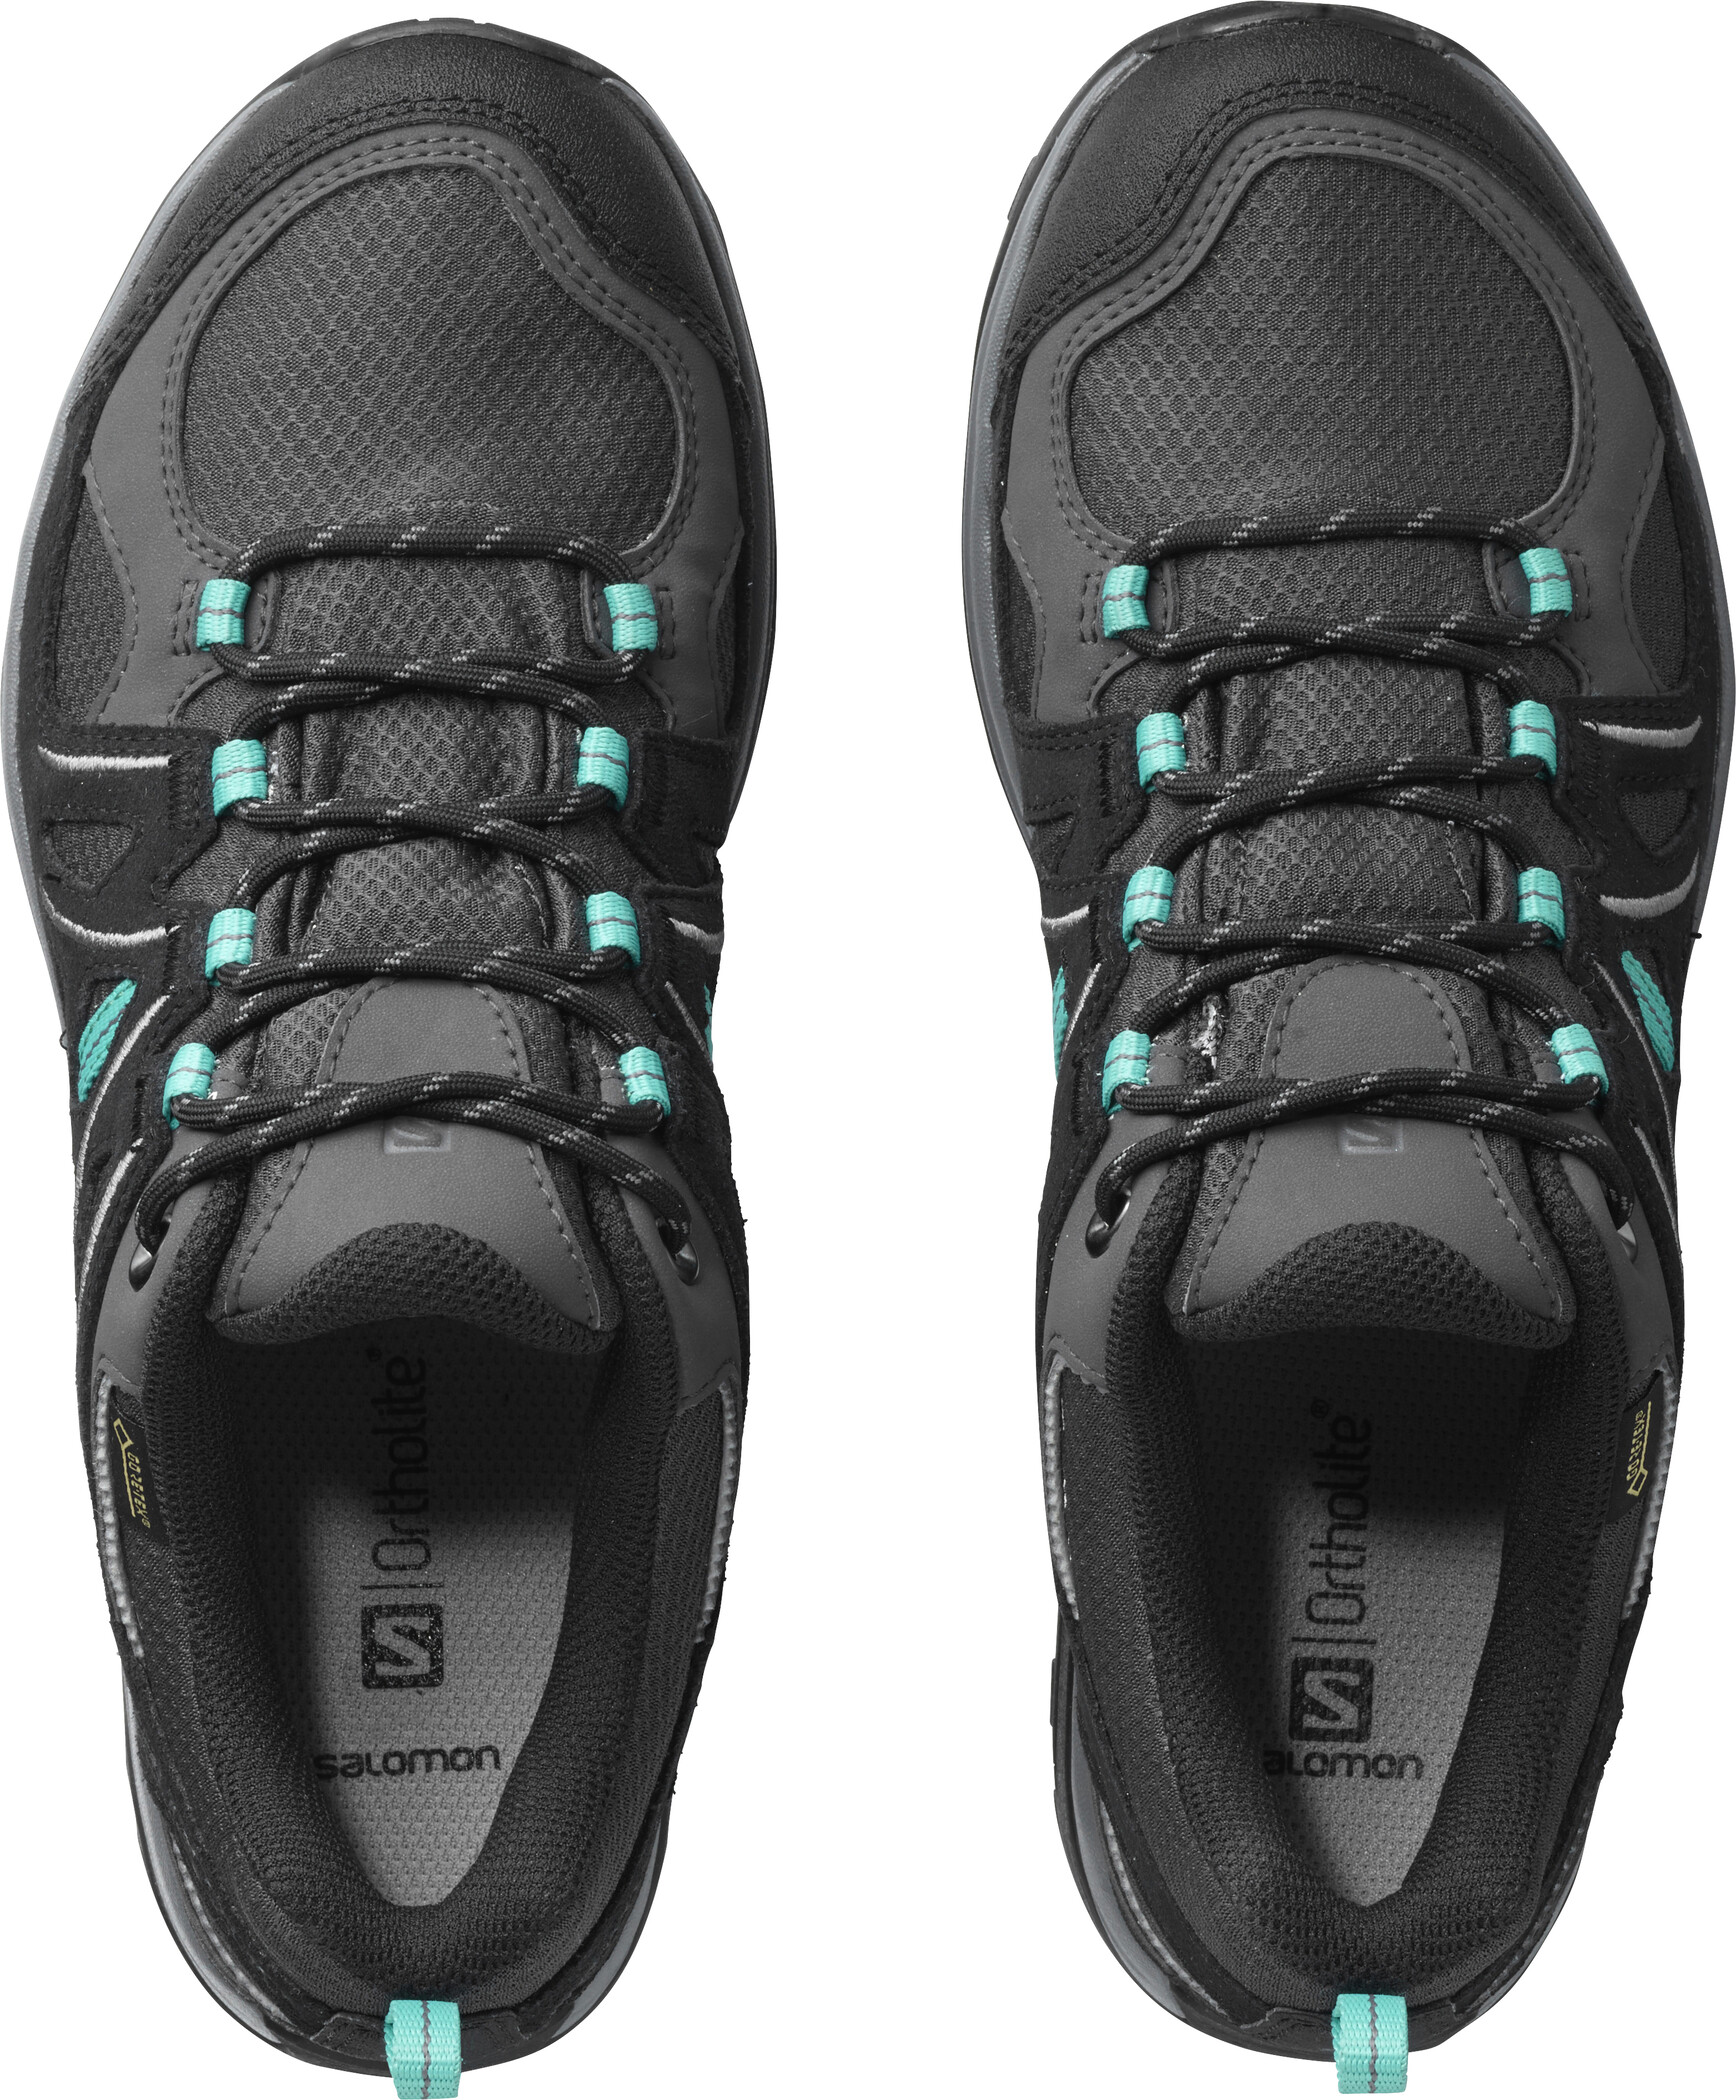 Salomon Ellipse 2 GTX Schuhe Damen magnetblackatlantis